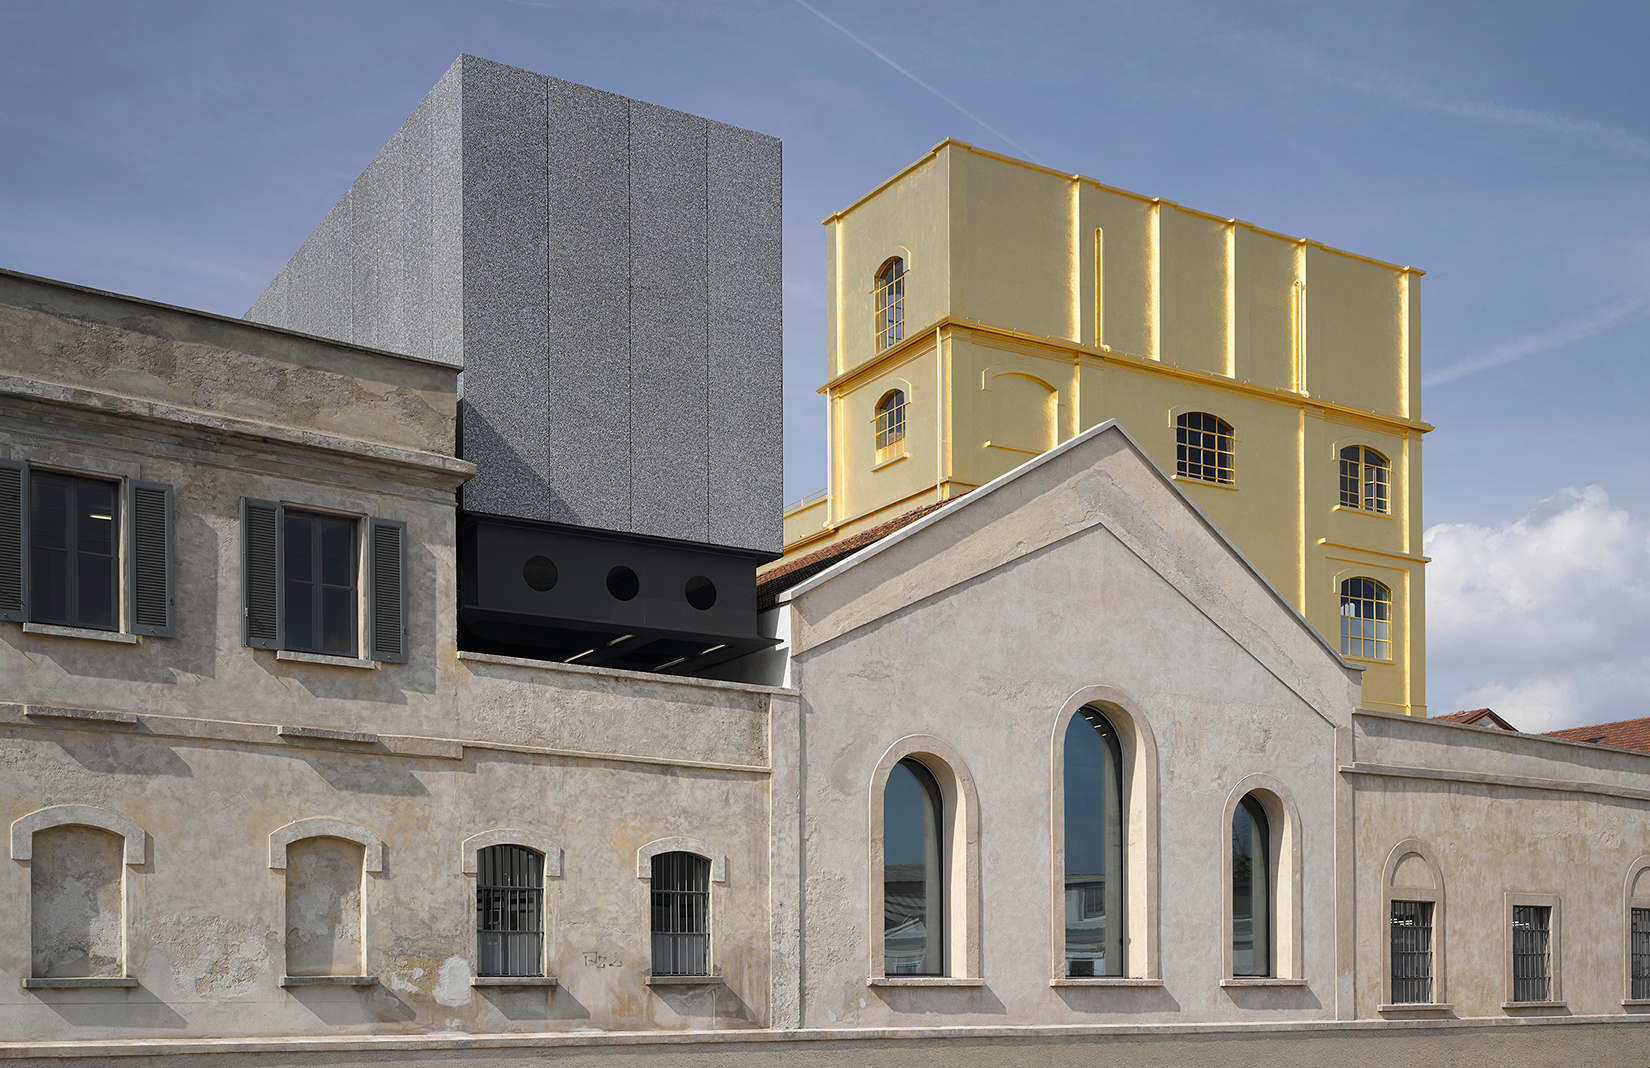 Fondazione Prada adaptive reuse